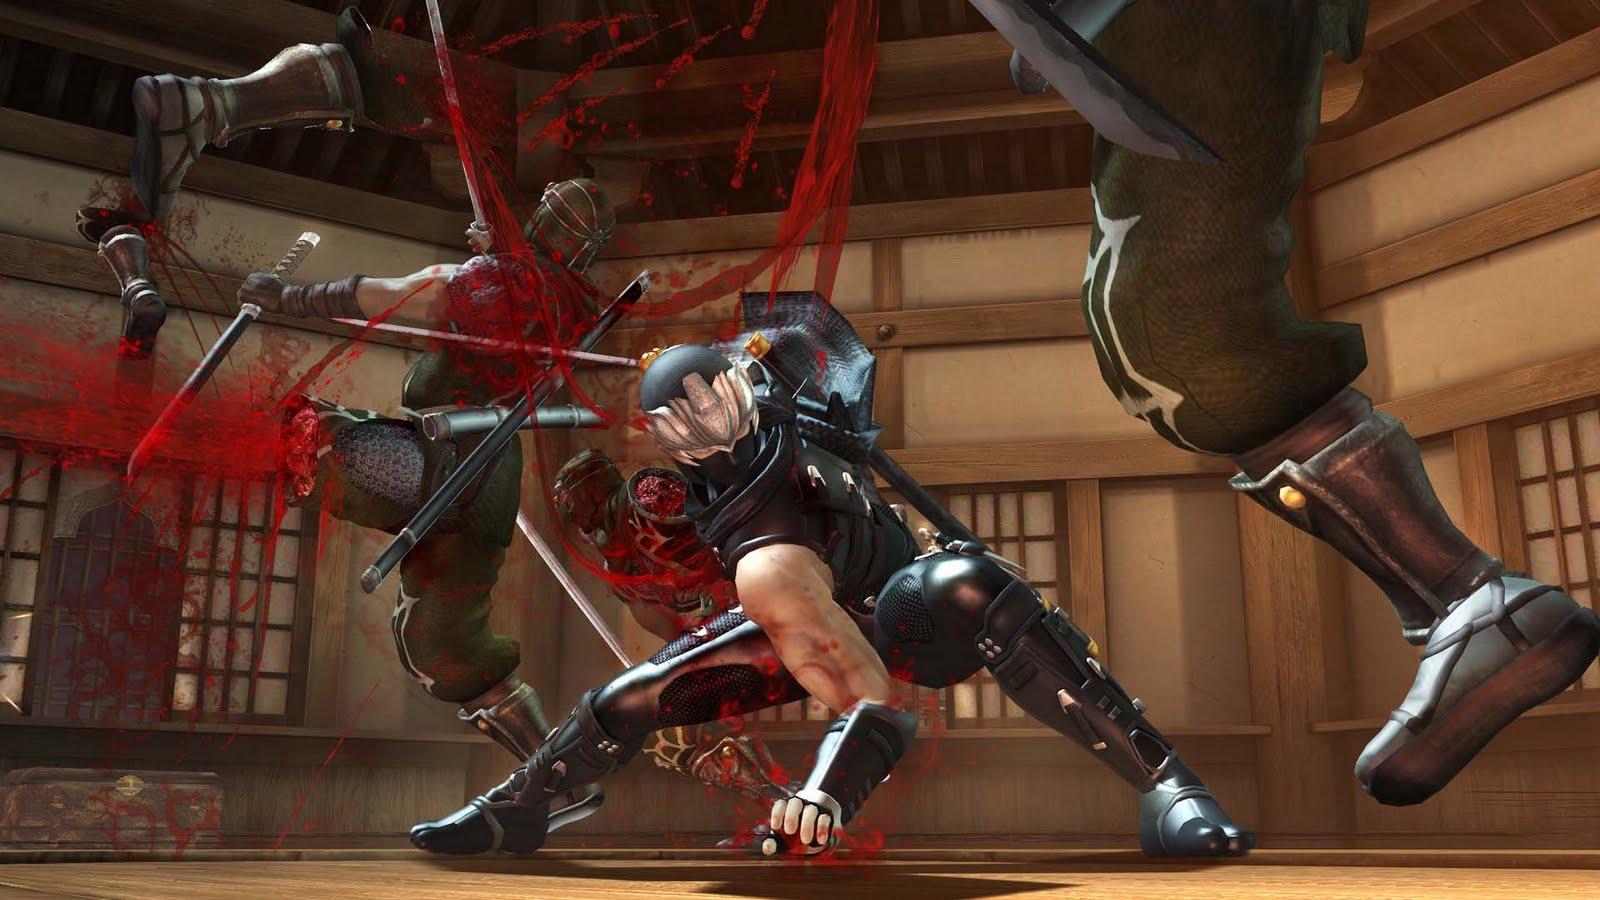 http://2.bp.blogspot.com/-wUKVa-L82YI/TkJGH7Jy3aI/AAAAAAAAB08/ora2tWKkEas/s1600/Ninja-Gaiden-3-ps3.jpg